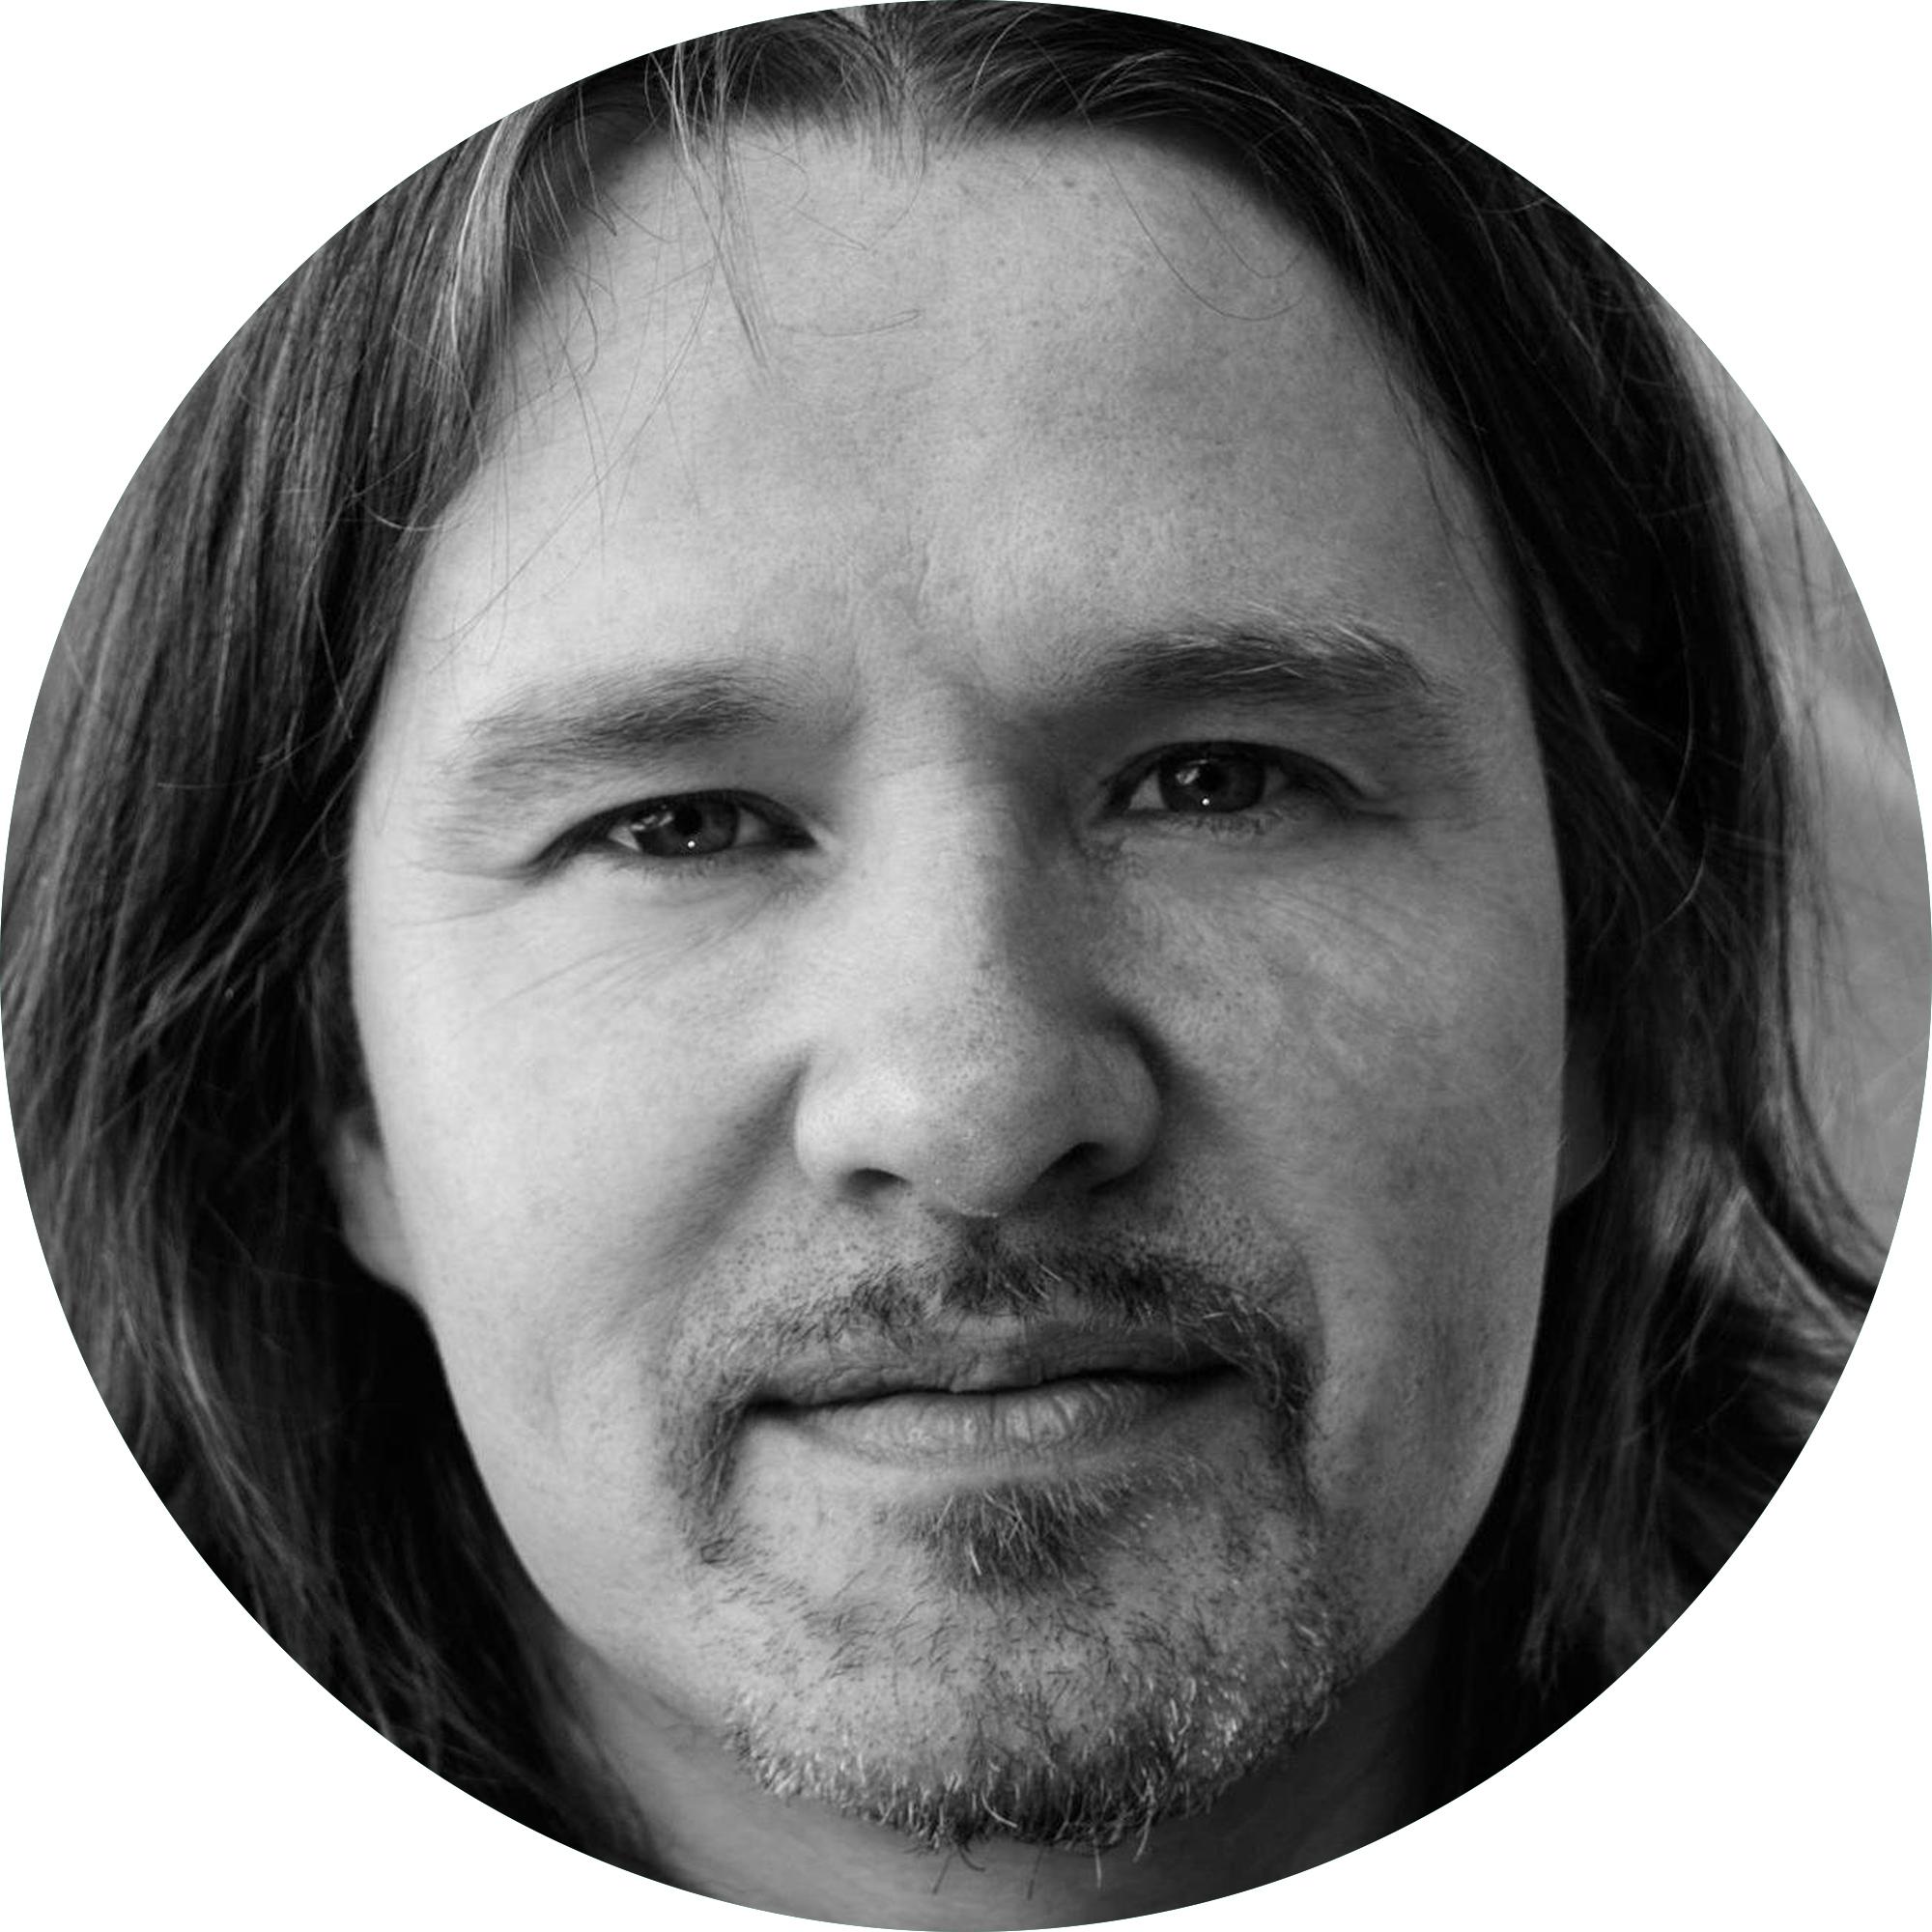 Håkon Øvreås